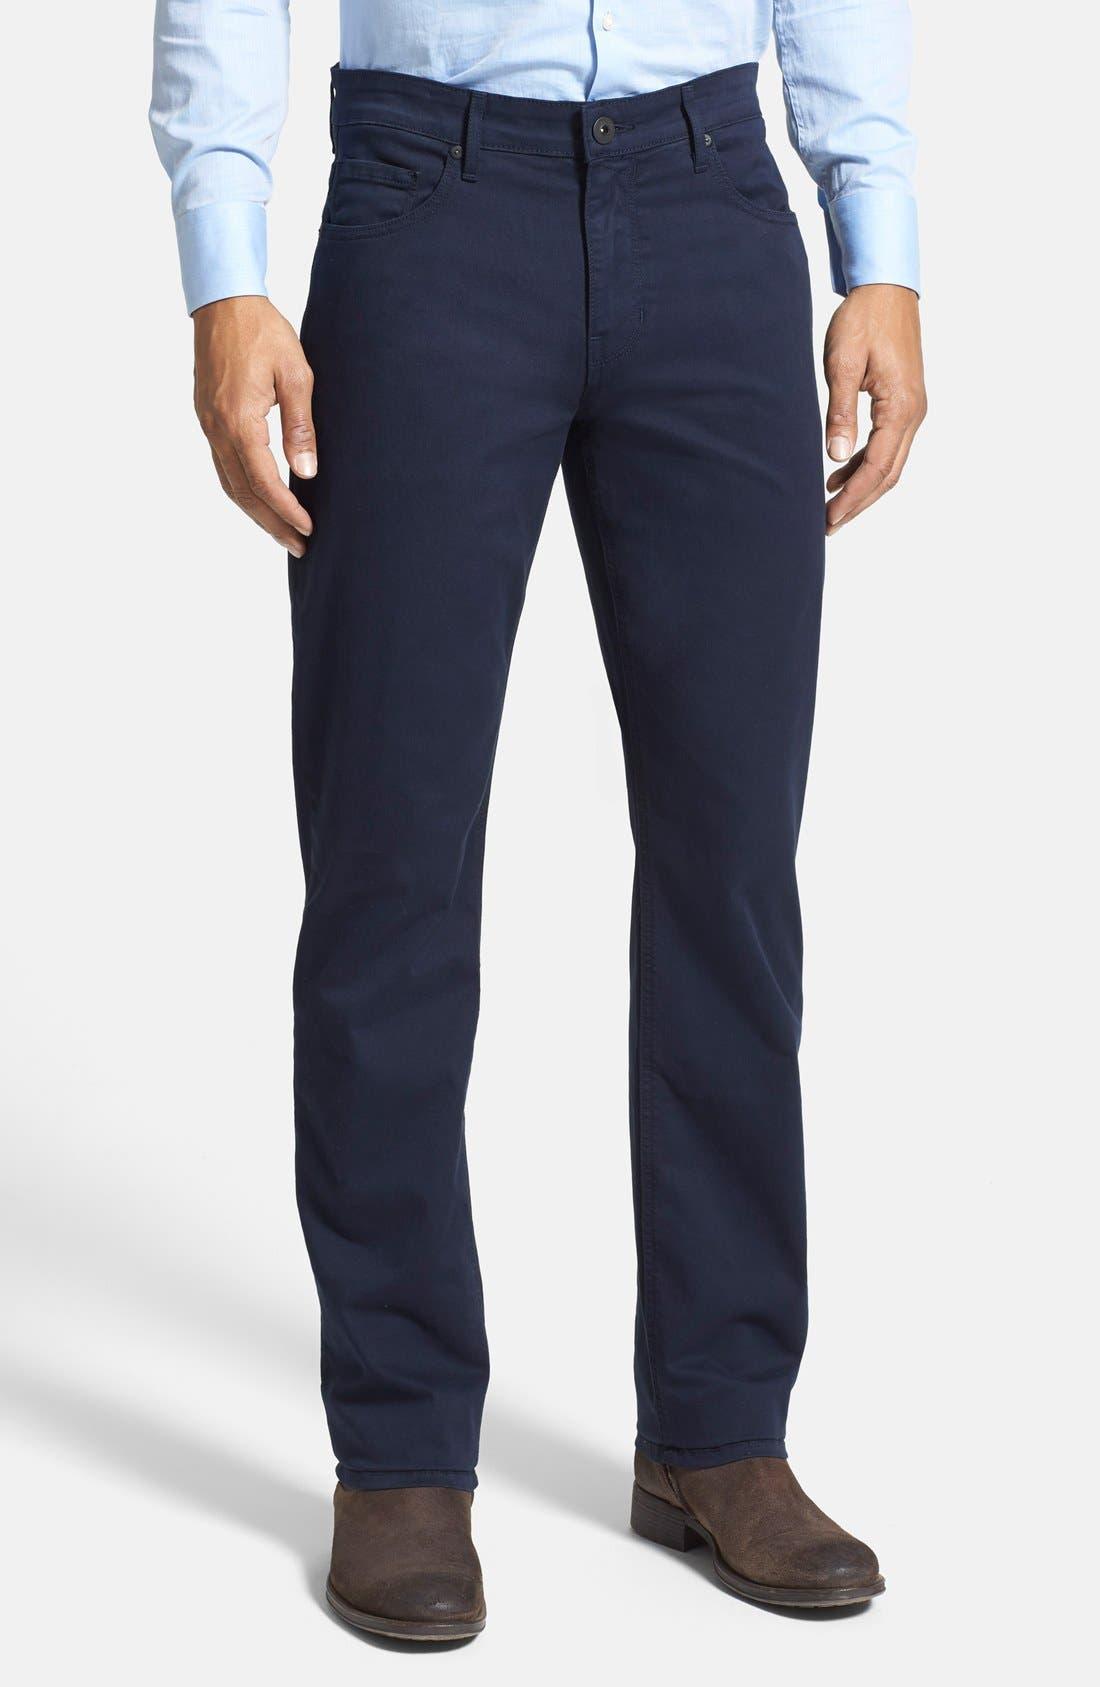 PAIGE Normandie Slim Straight Leg Twill Pants